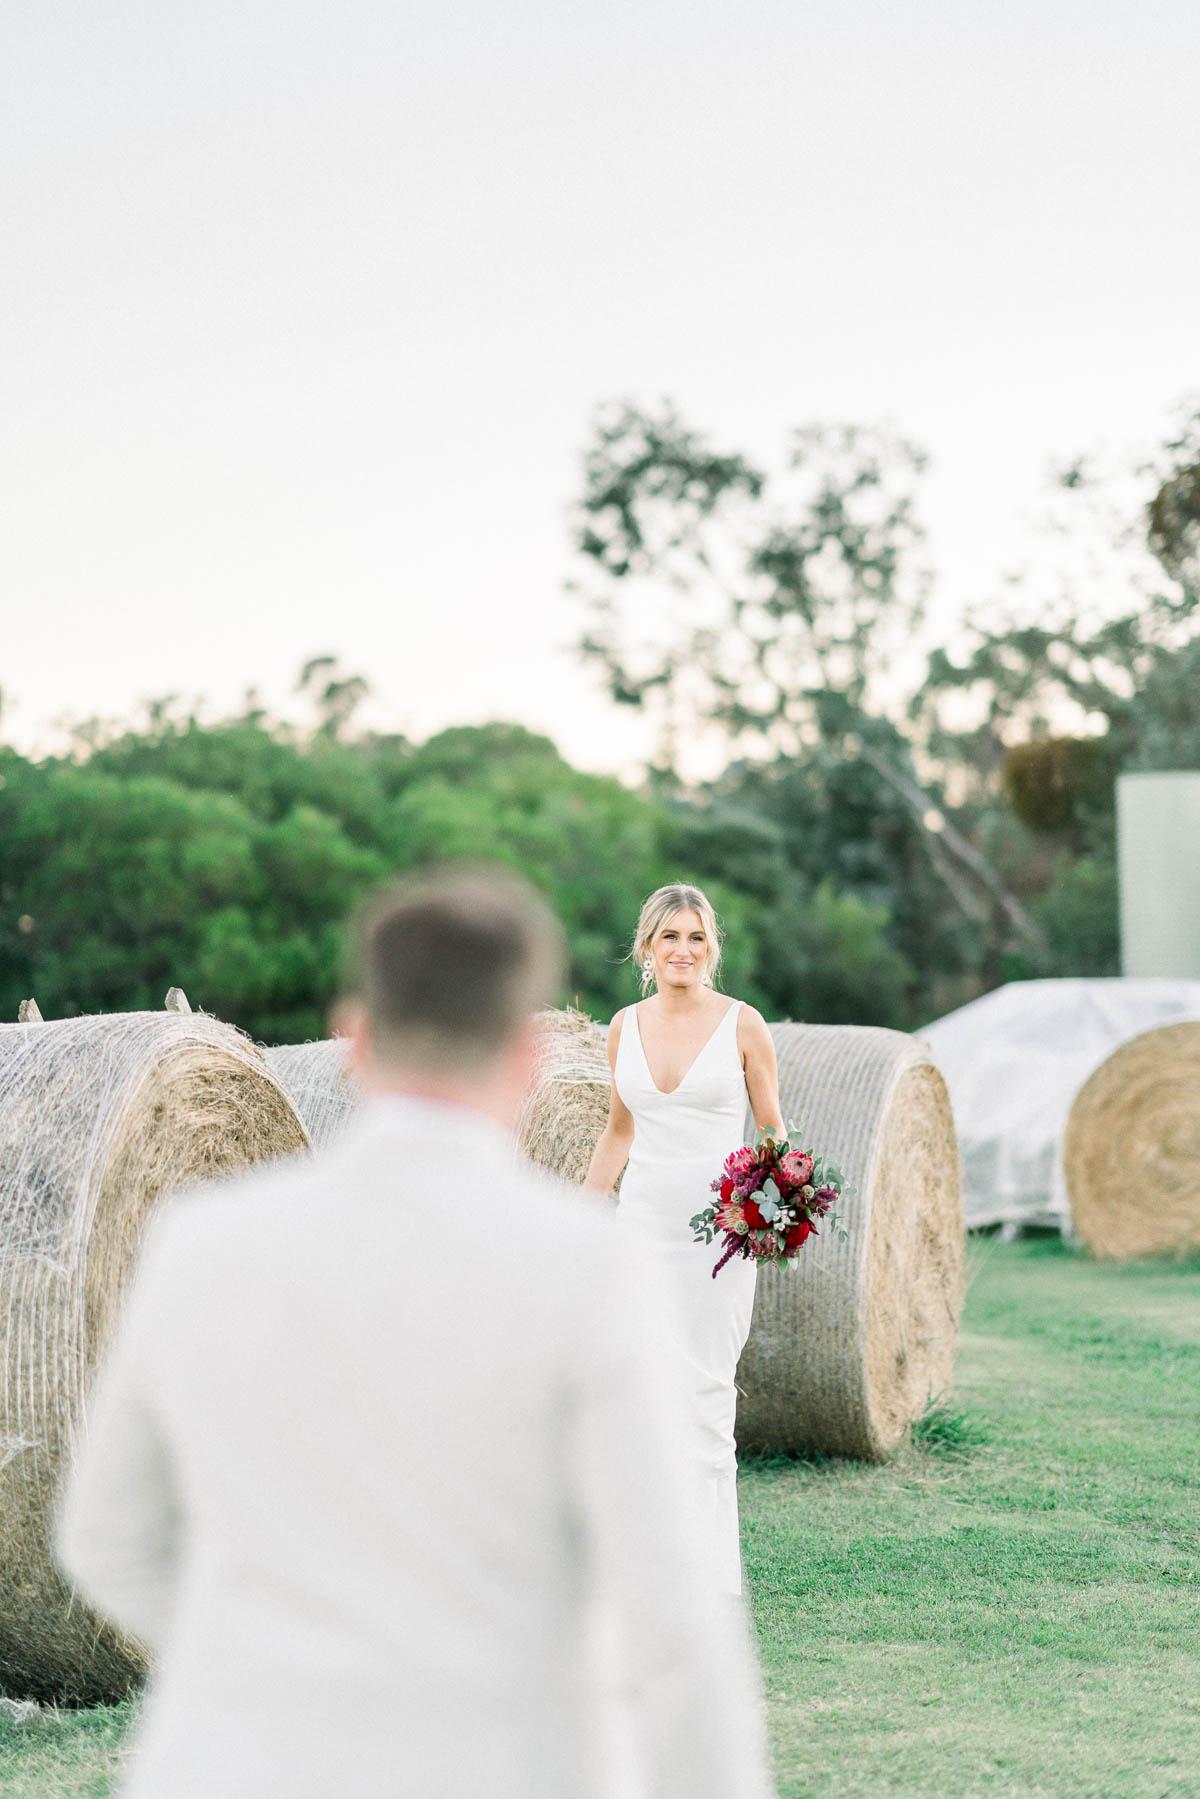 rustic-yarra-valley-wedding-venue-acacia-ridge-georgia-james-08372.jpg